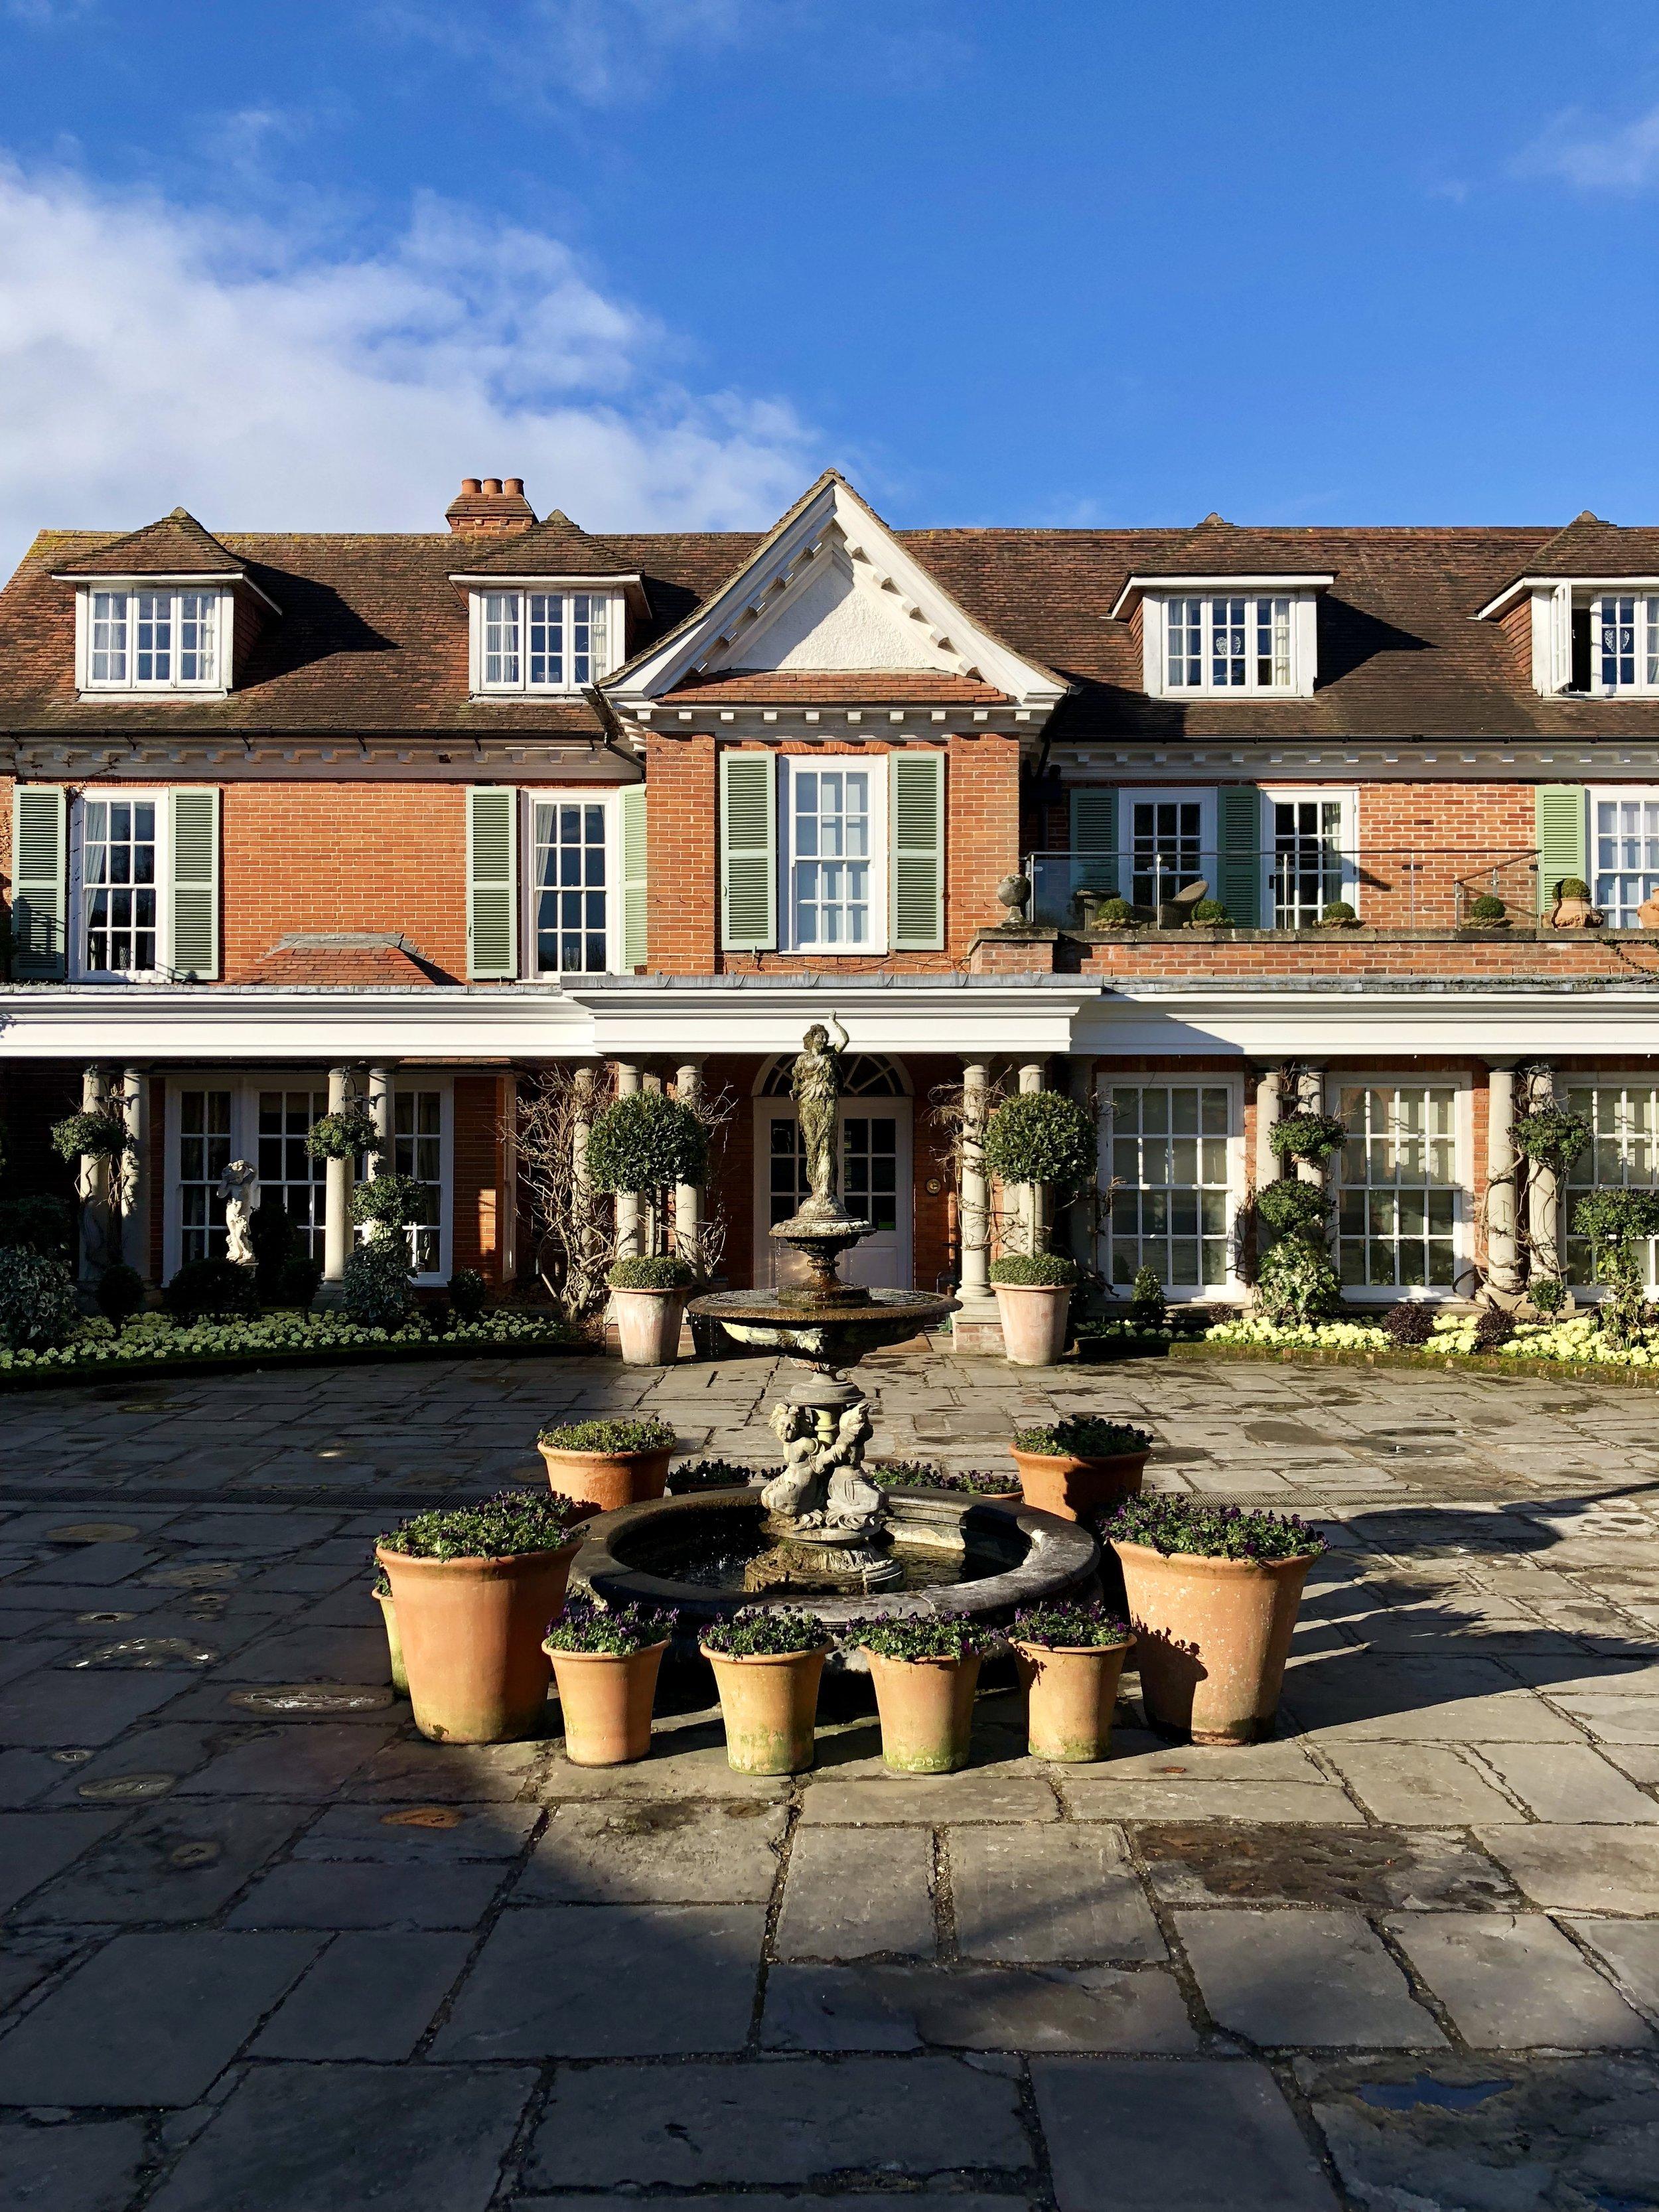 chewton_glen_hotel_hampshire.jpg